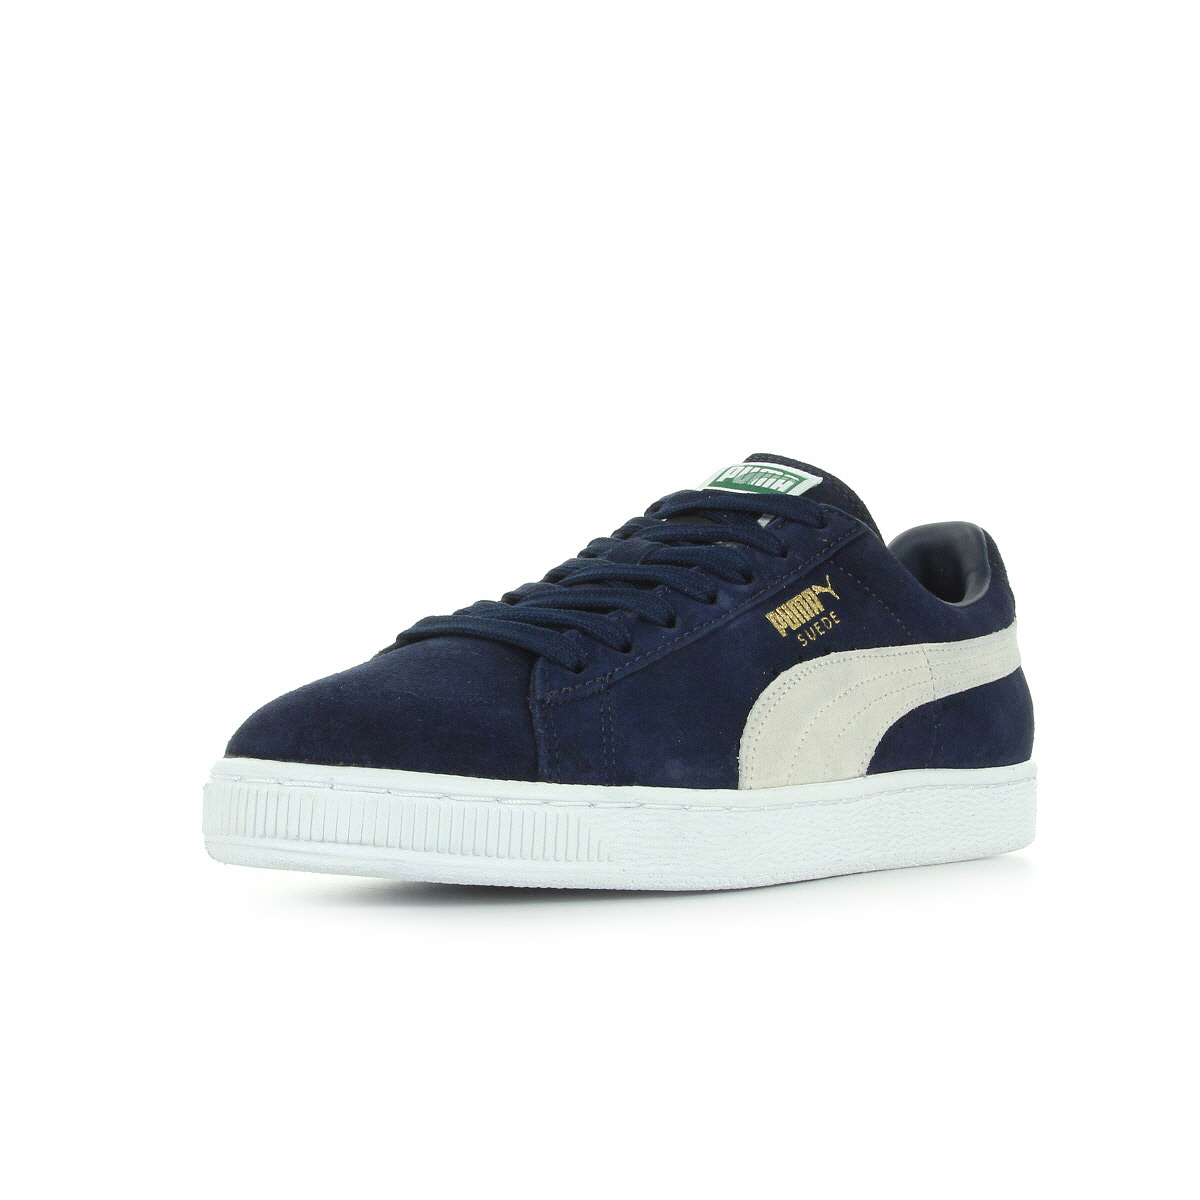 Puma Suede Classic + 35656851, Baskets mode homme